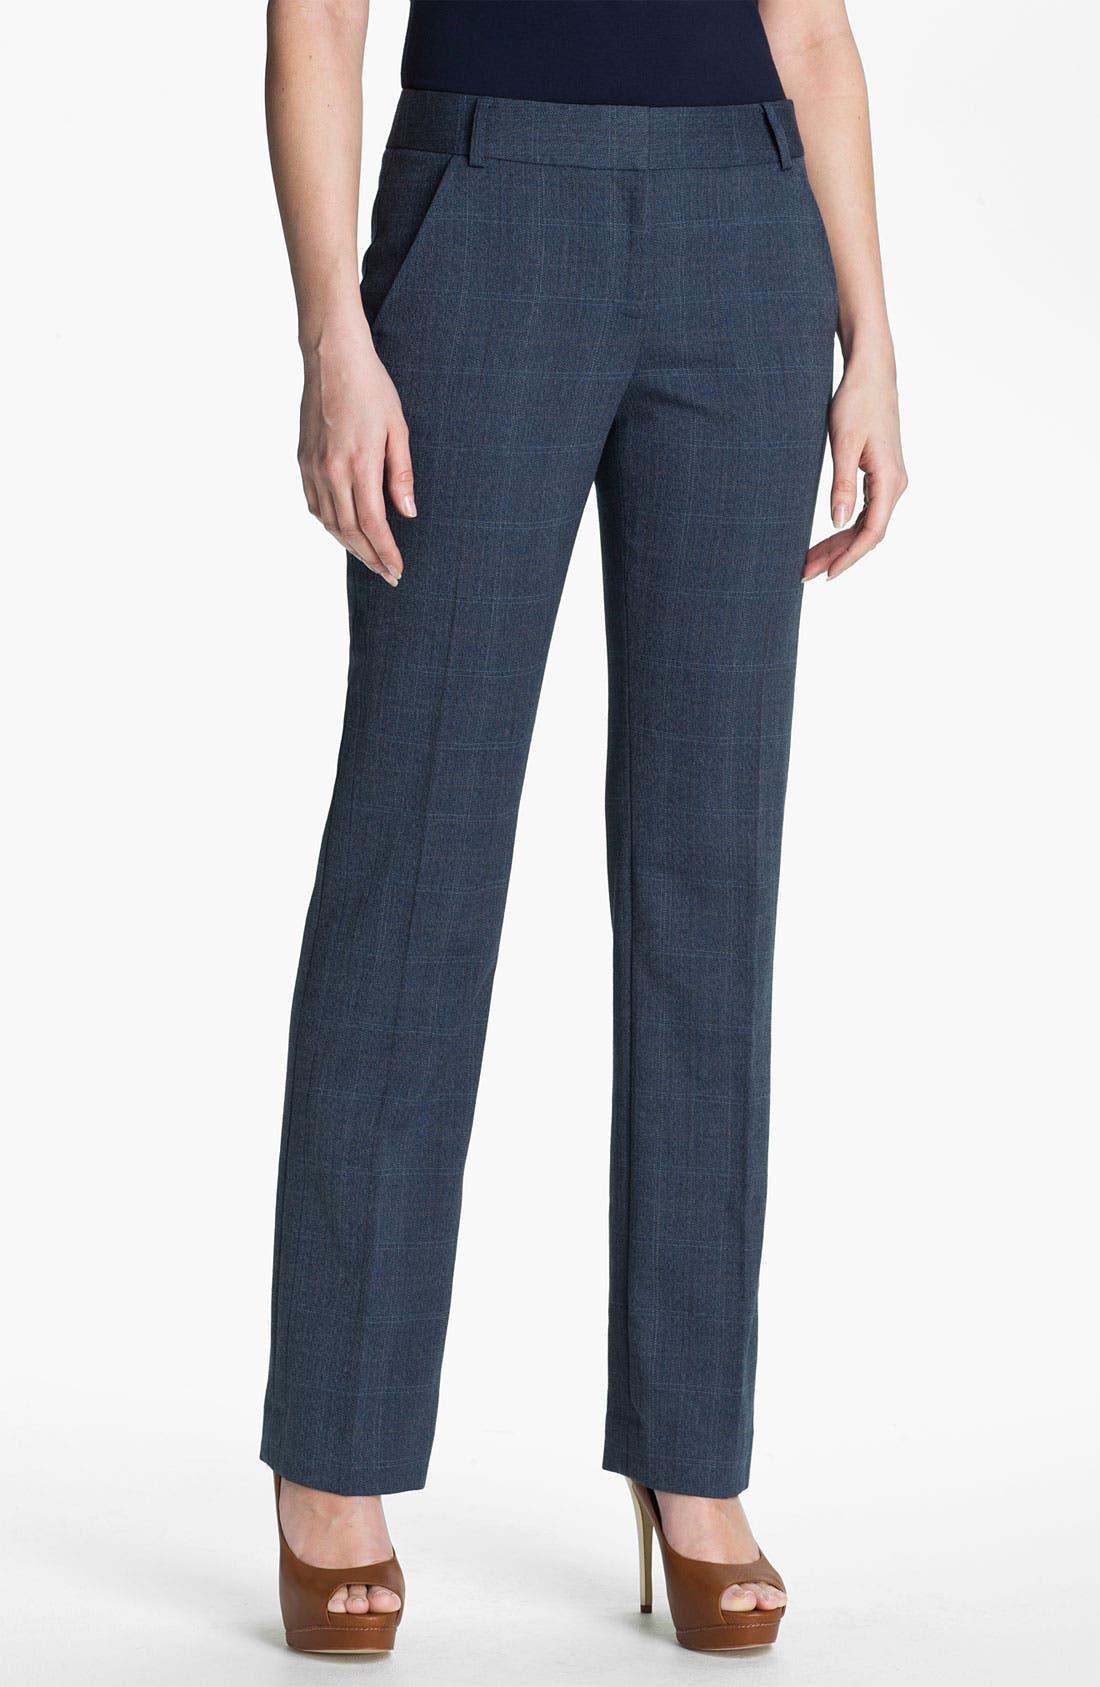 Alternate Image 1 Selected - Anne Klein Patterned Menswear Pants